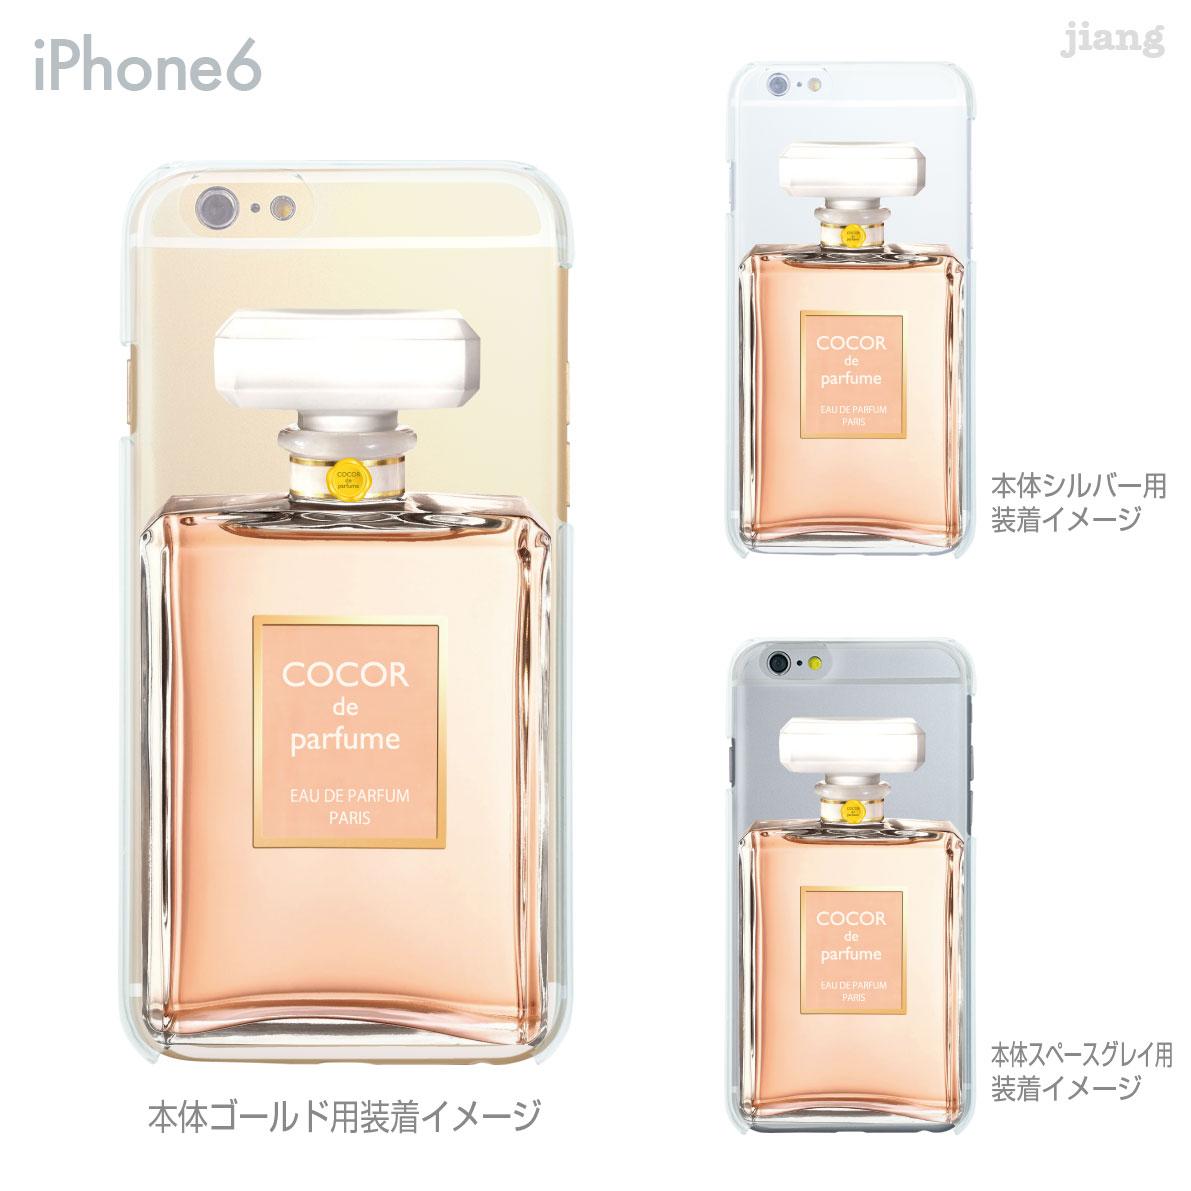 iPhone6ケース 【楽天市場】iPhone6s iPhone6 Plus iphone ケ.